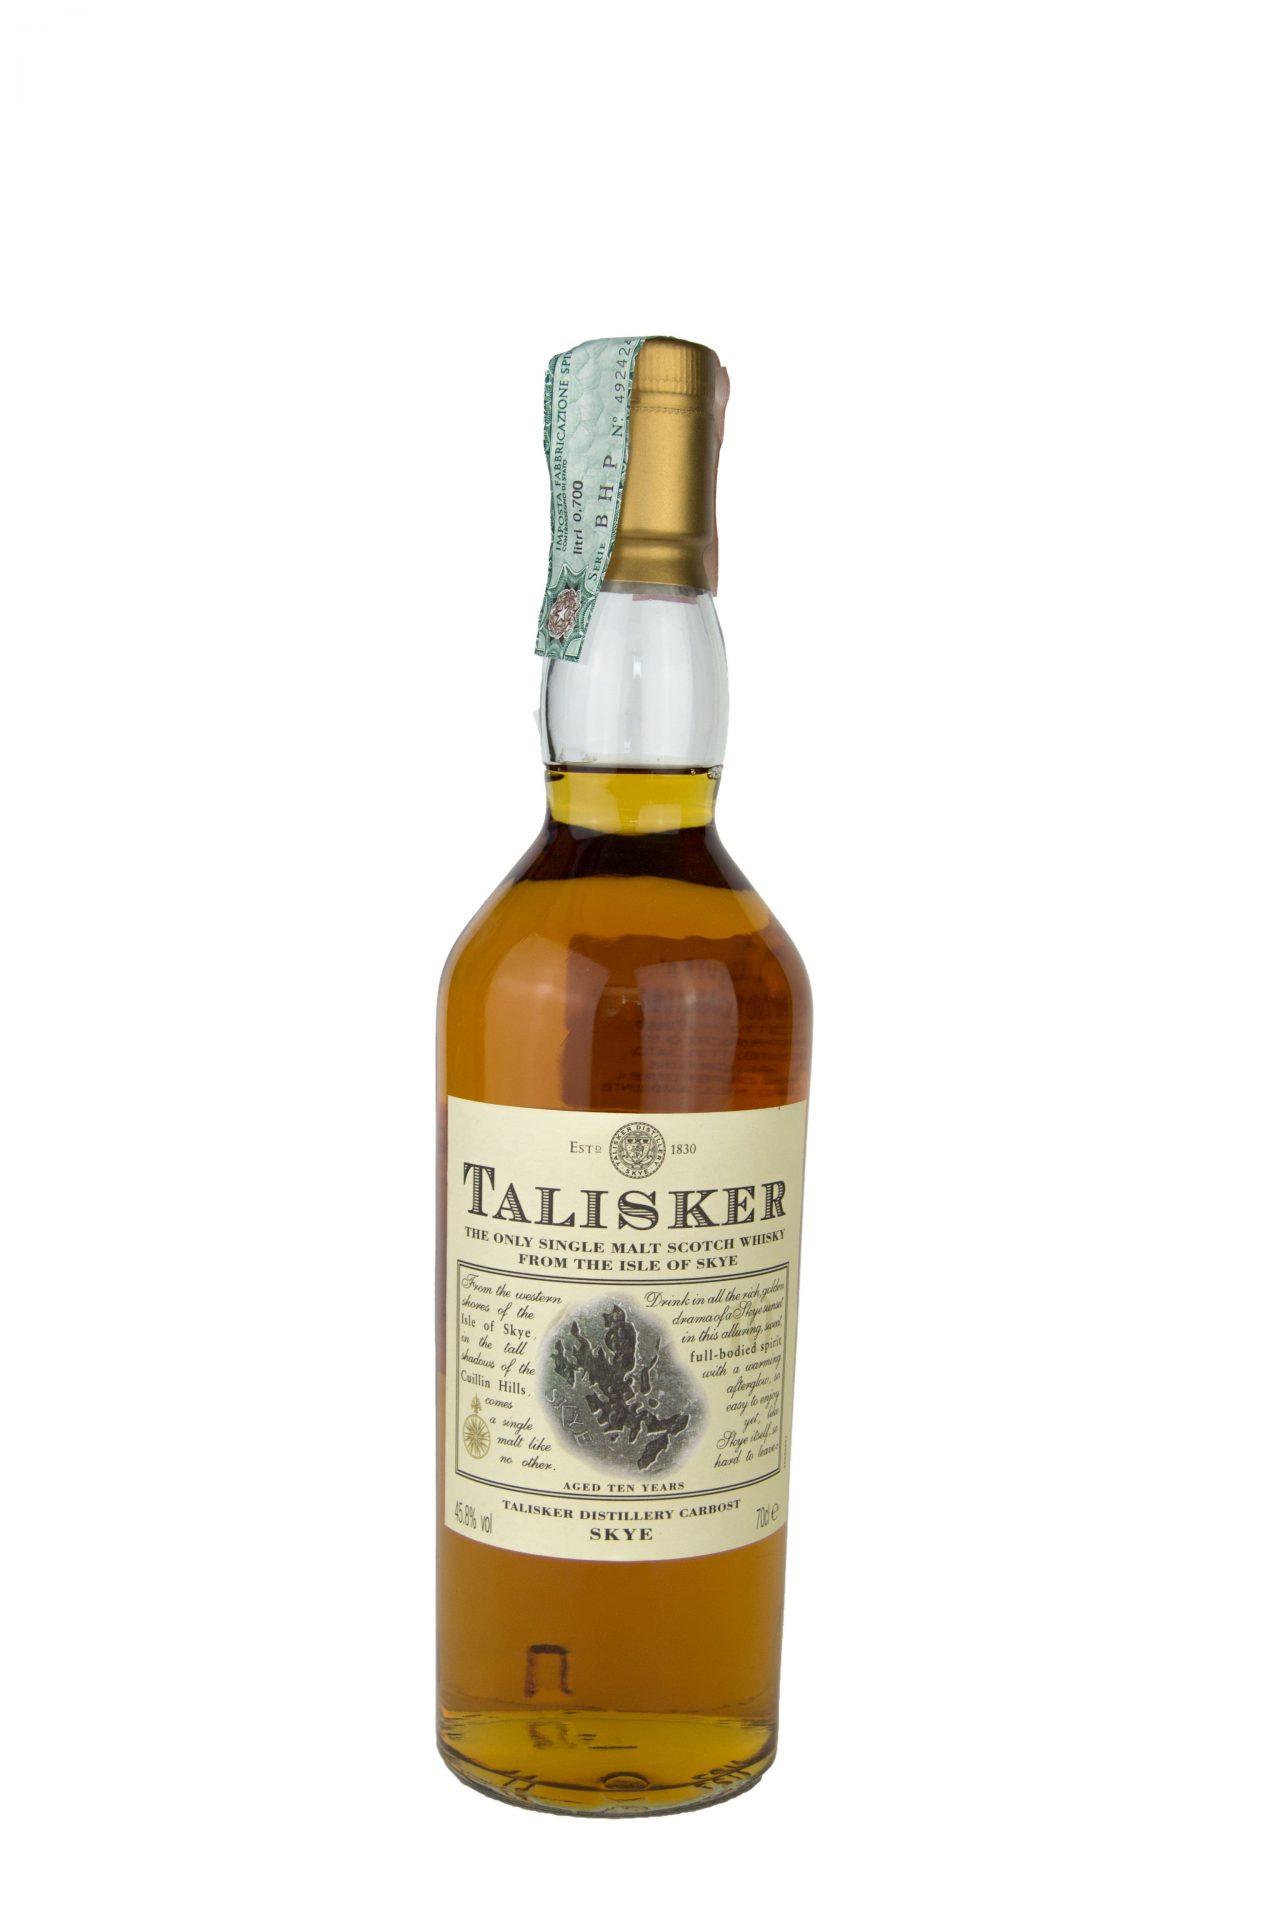 Talisker – Single Malt Scotch Whisky From The Isle Of Skye